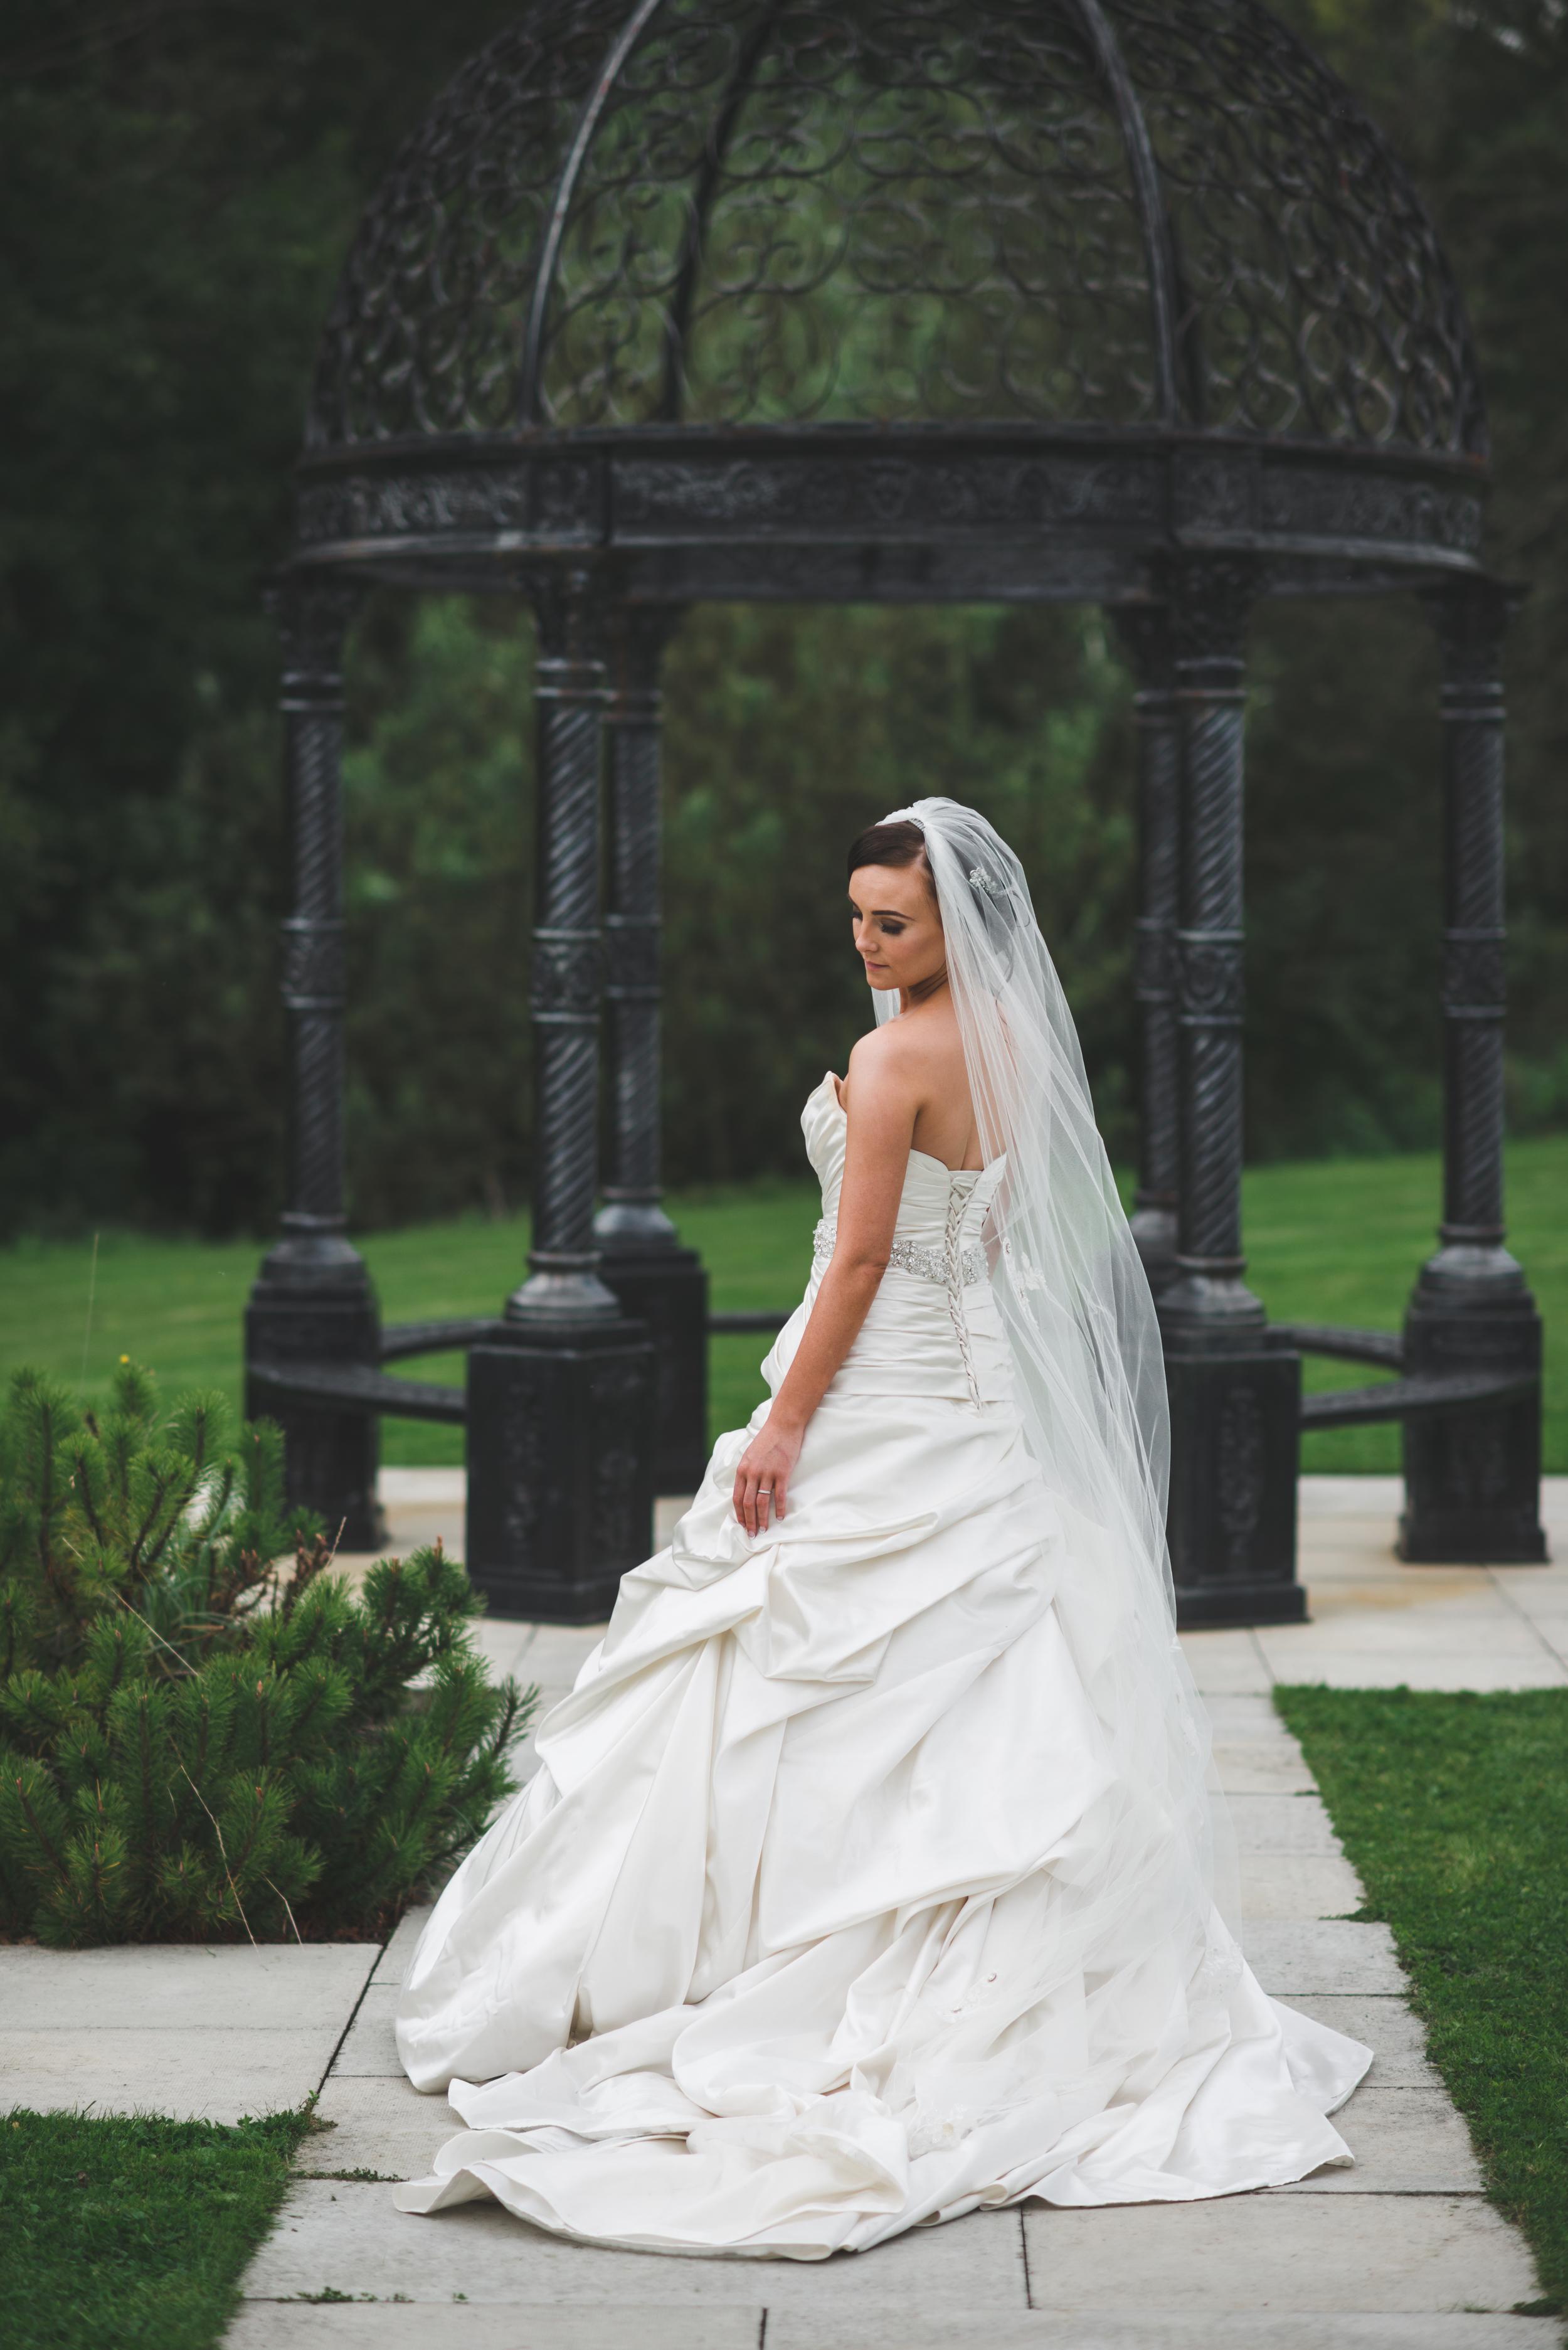 Northern_Ireland_Wedding_Photographer_Purephotoni_Dunsilly_Hotel_Bride